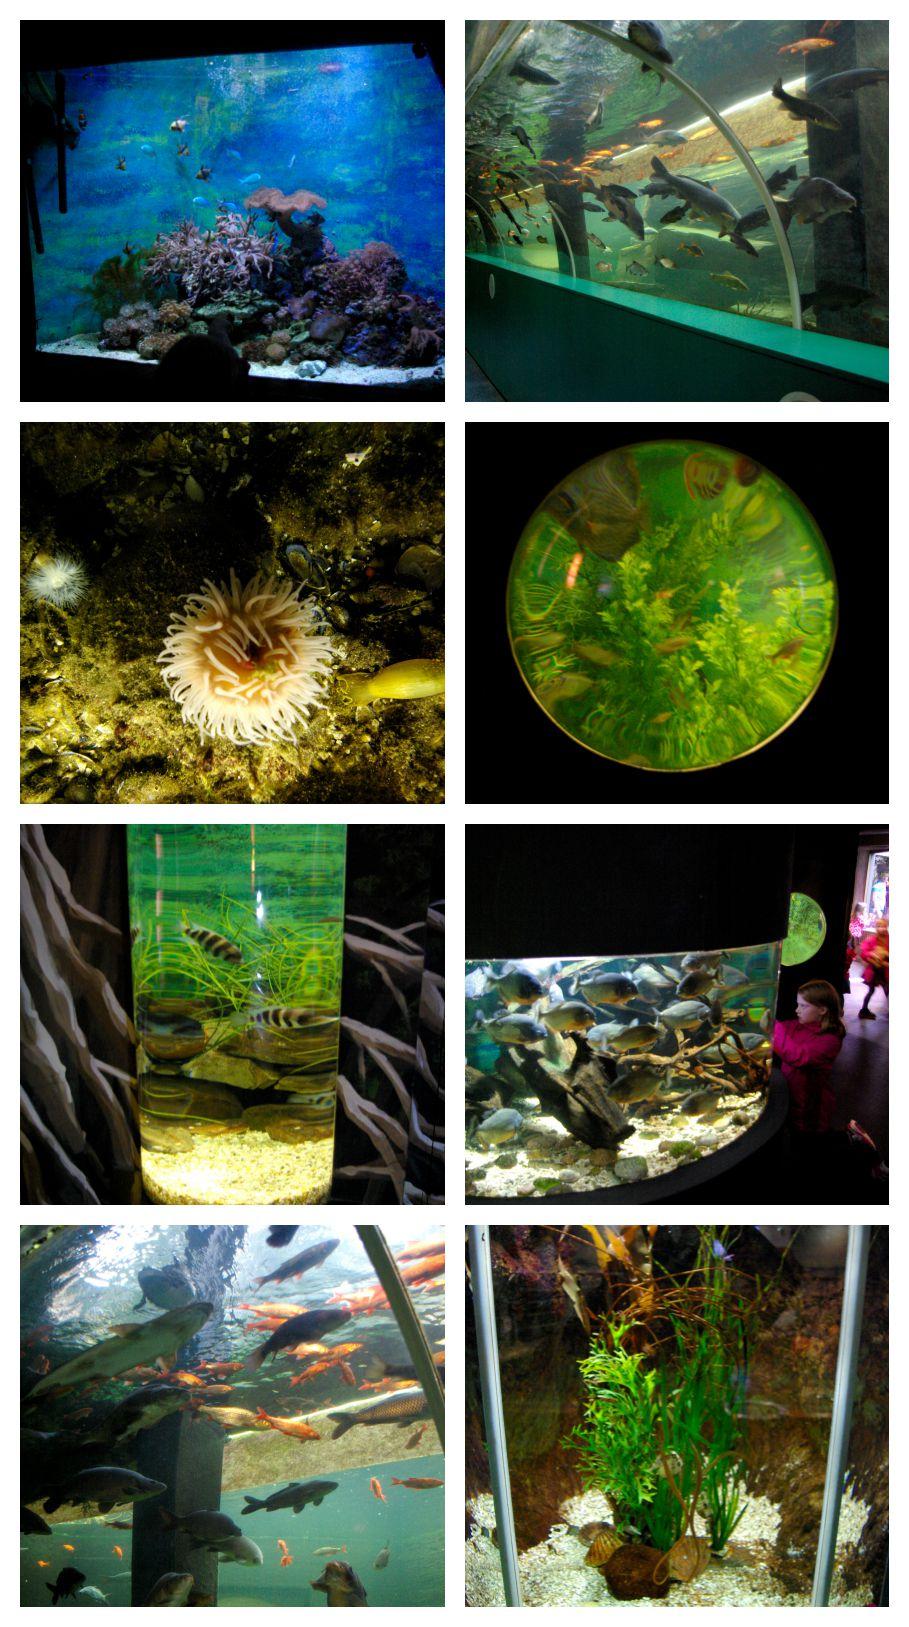 Fish and other exhibits at Lakes Aquarium